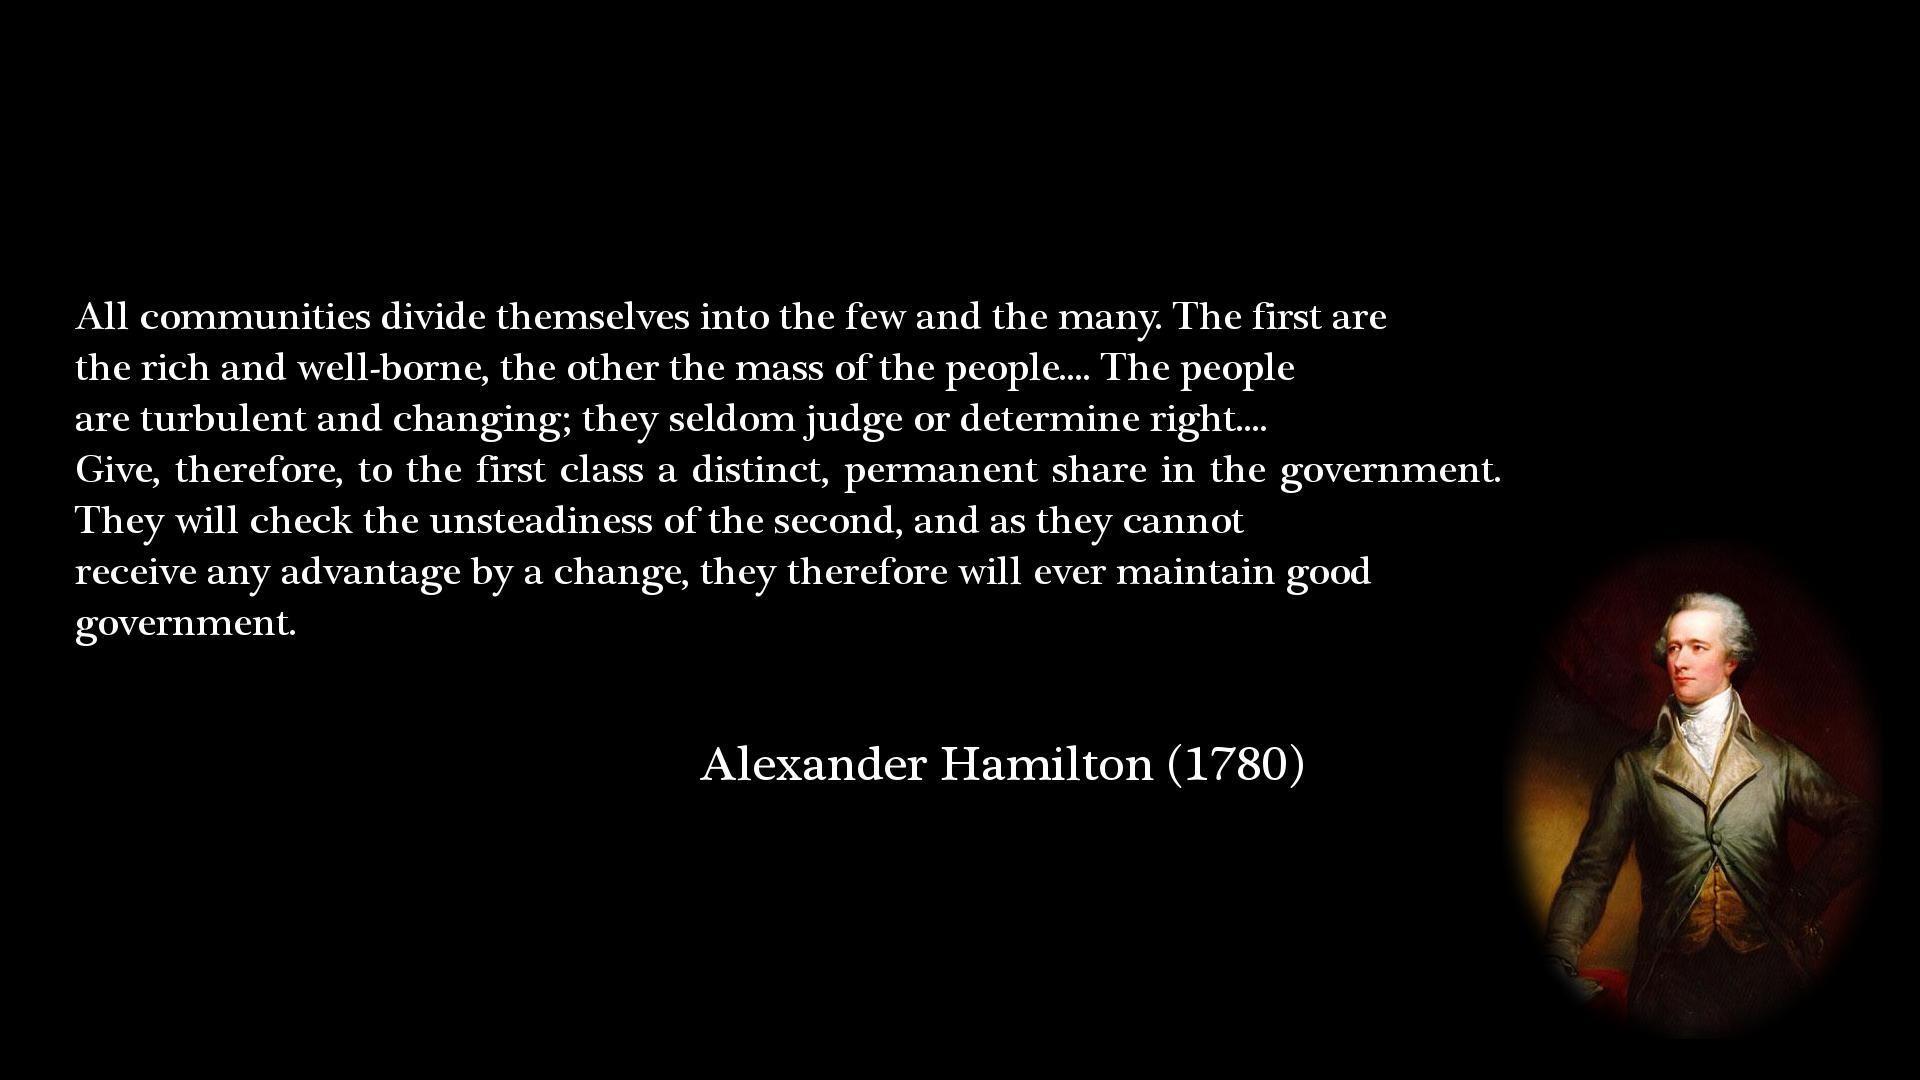 Alexander Hamilton Wallpaper 74 images